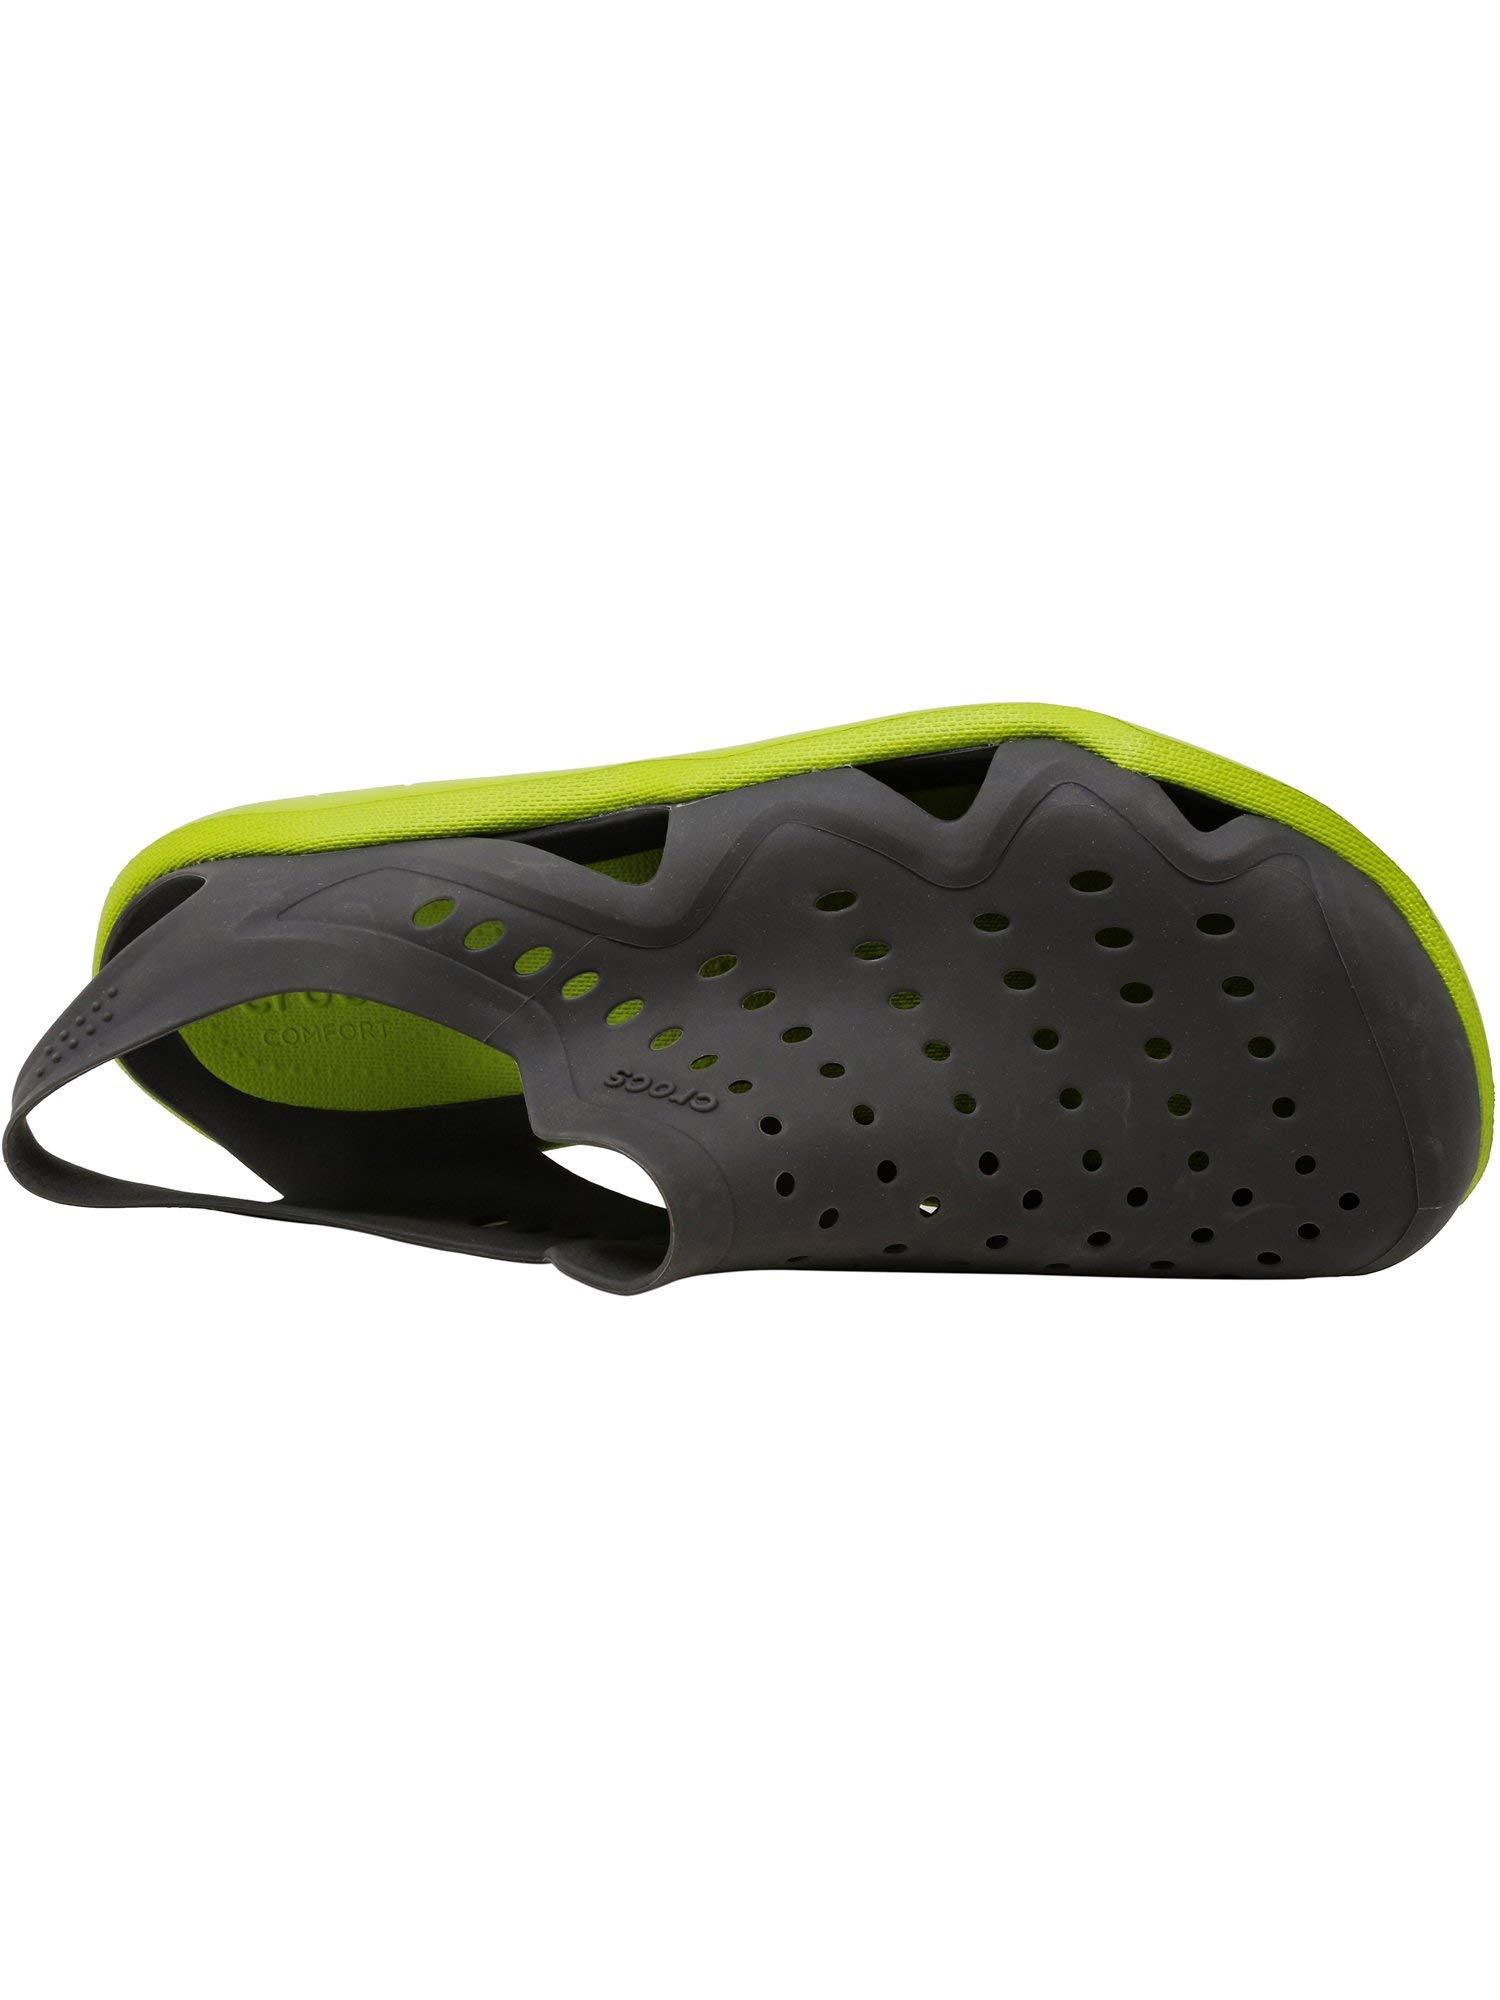 Crocs Men's Swiftwater Wave Graphite/Volt Green Ankle-High Rubber Sandal - 4M by Crocs (Image #5)